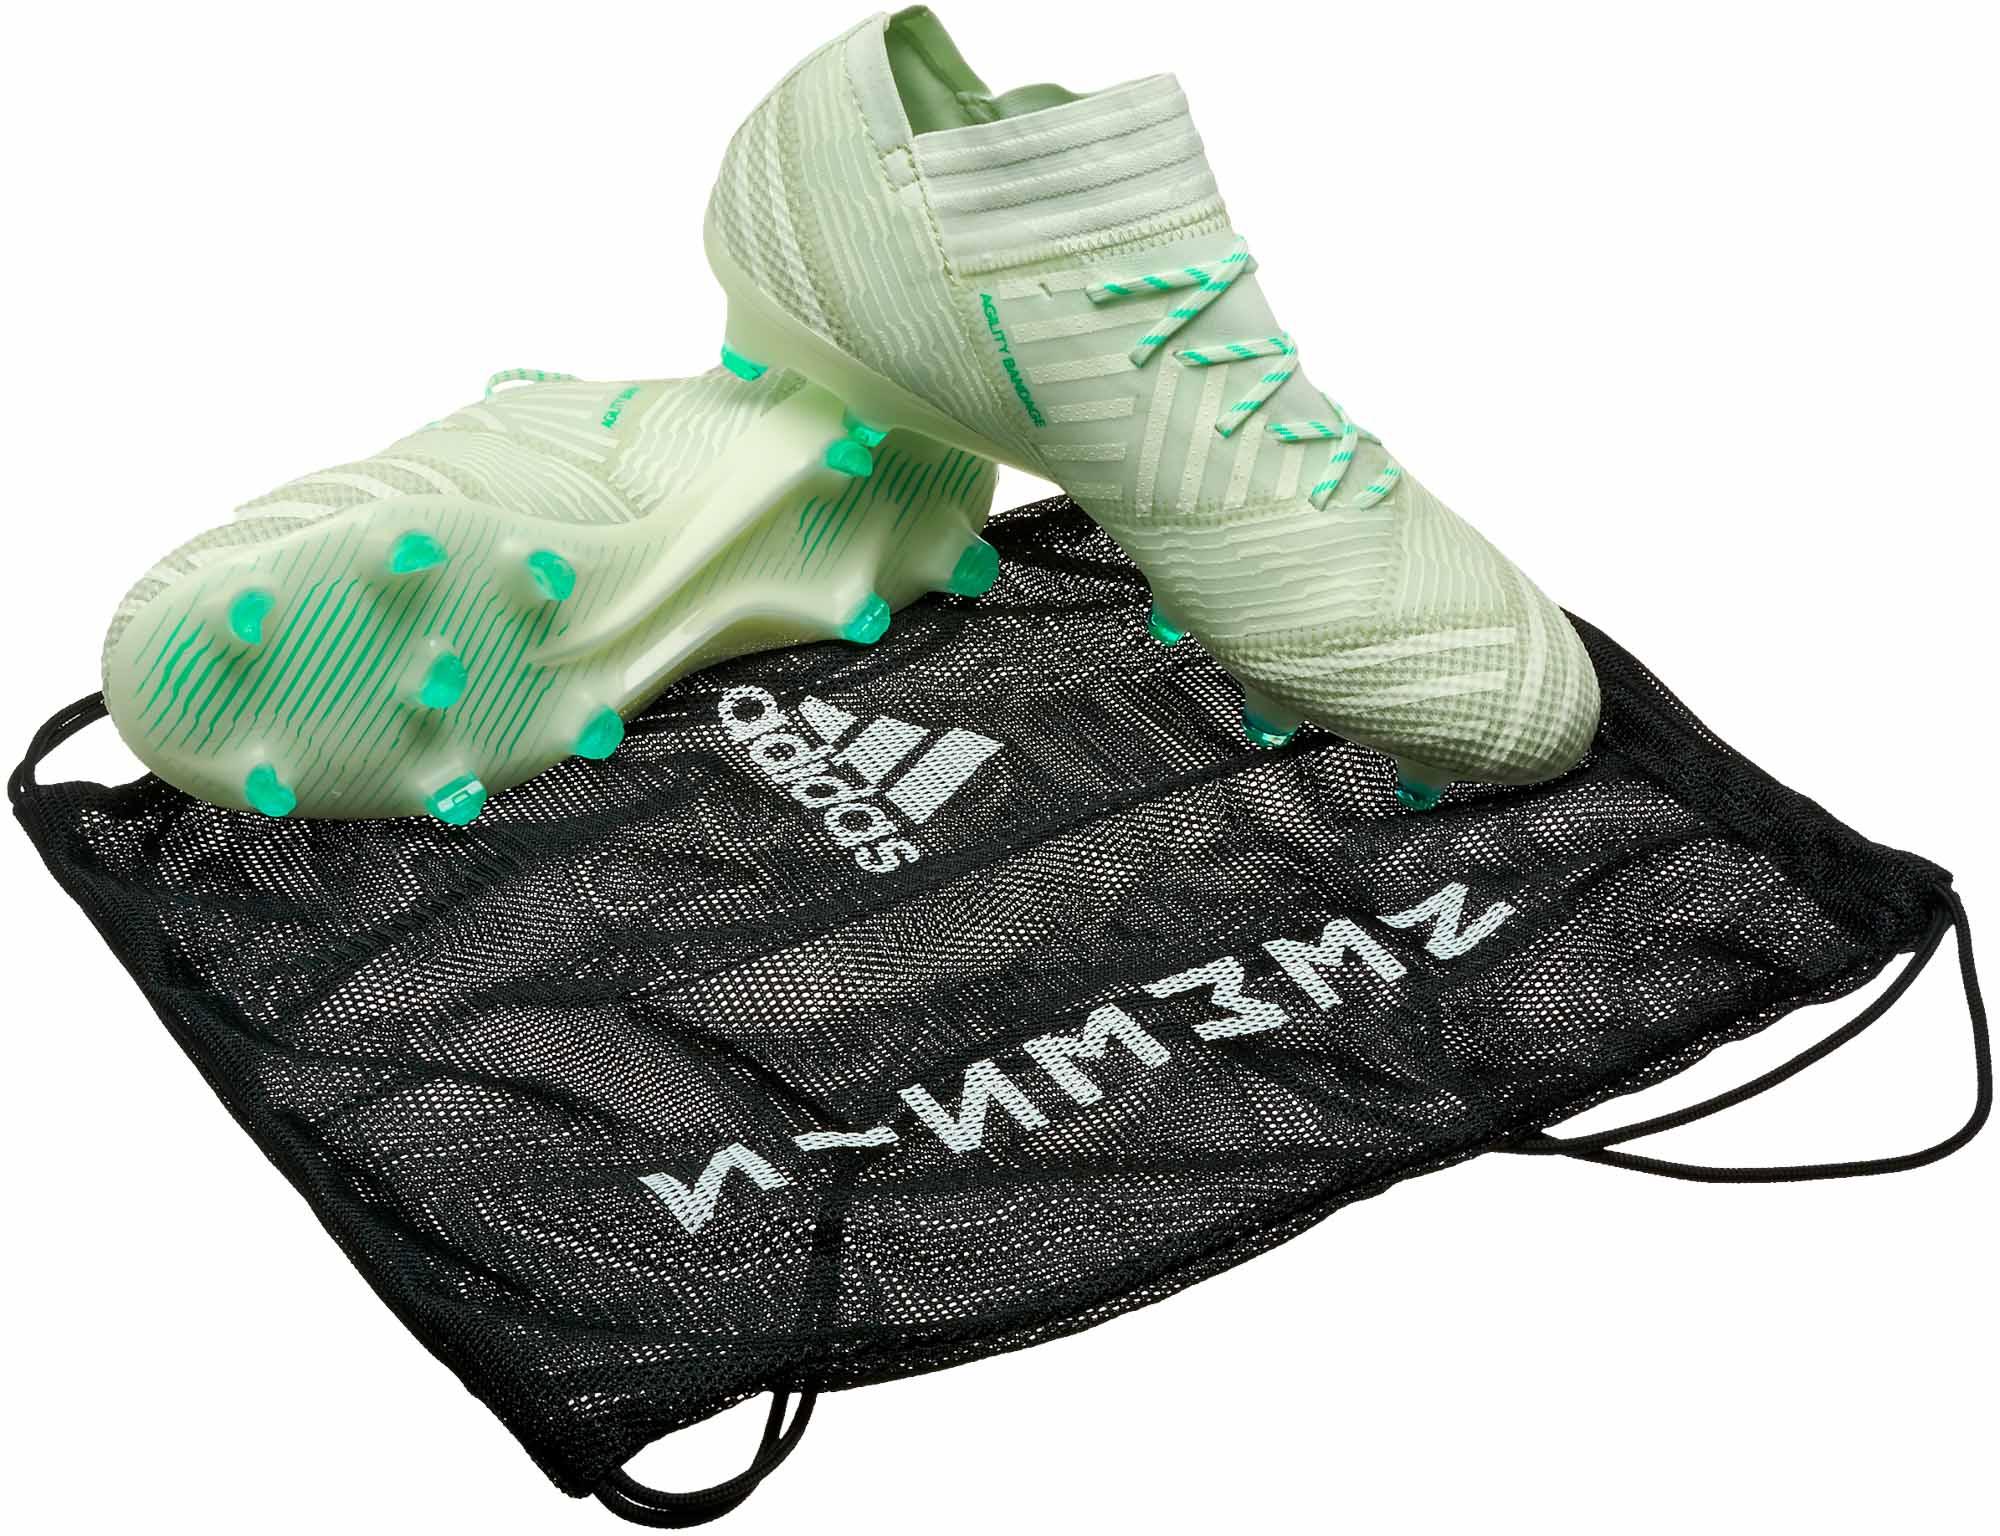 in stock 39a09 fd644 adidas Nemeziz 17.1 FG – Aero GreenHi-Res Green